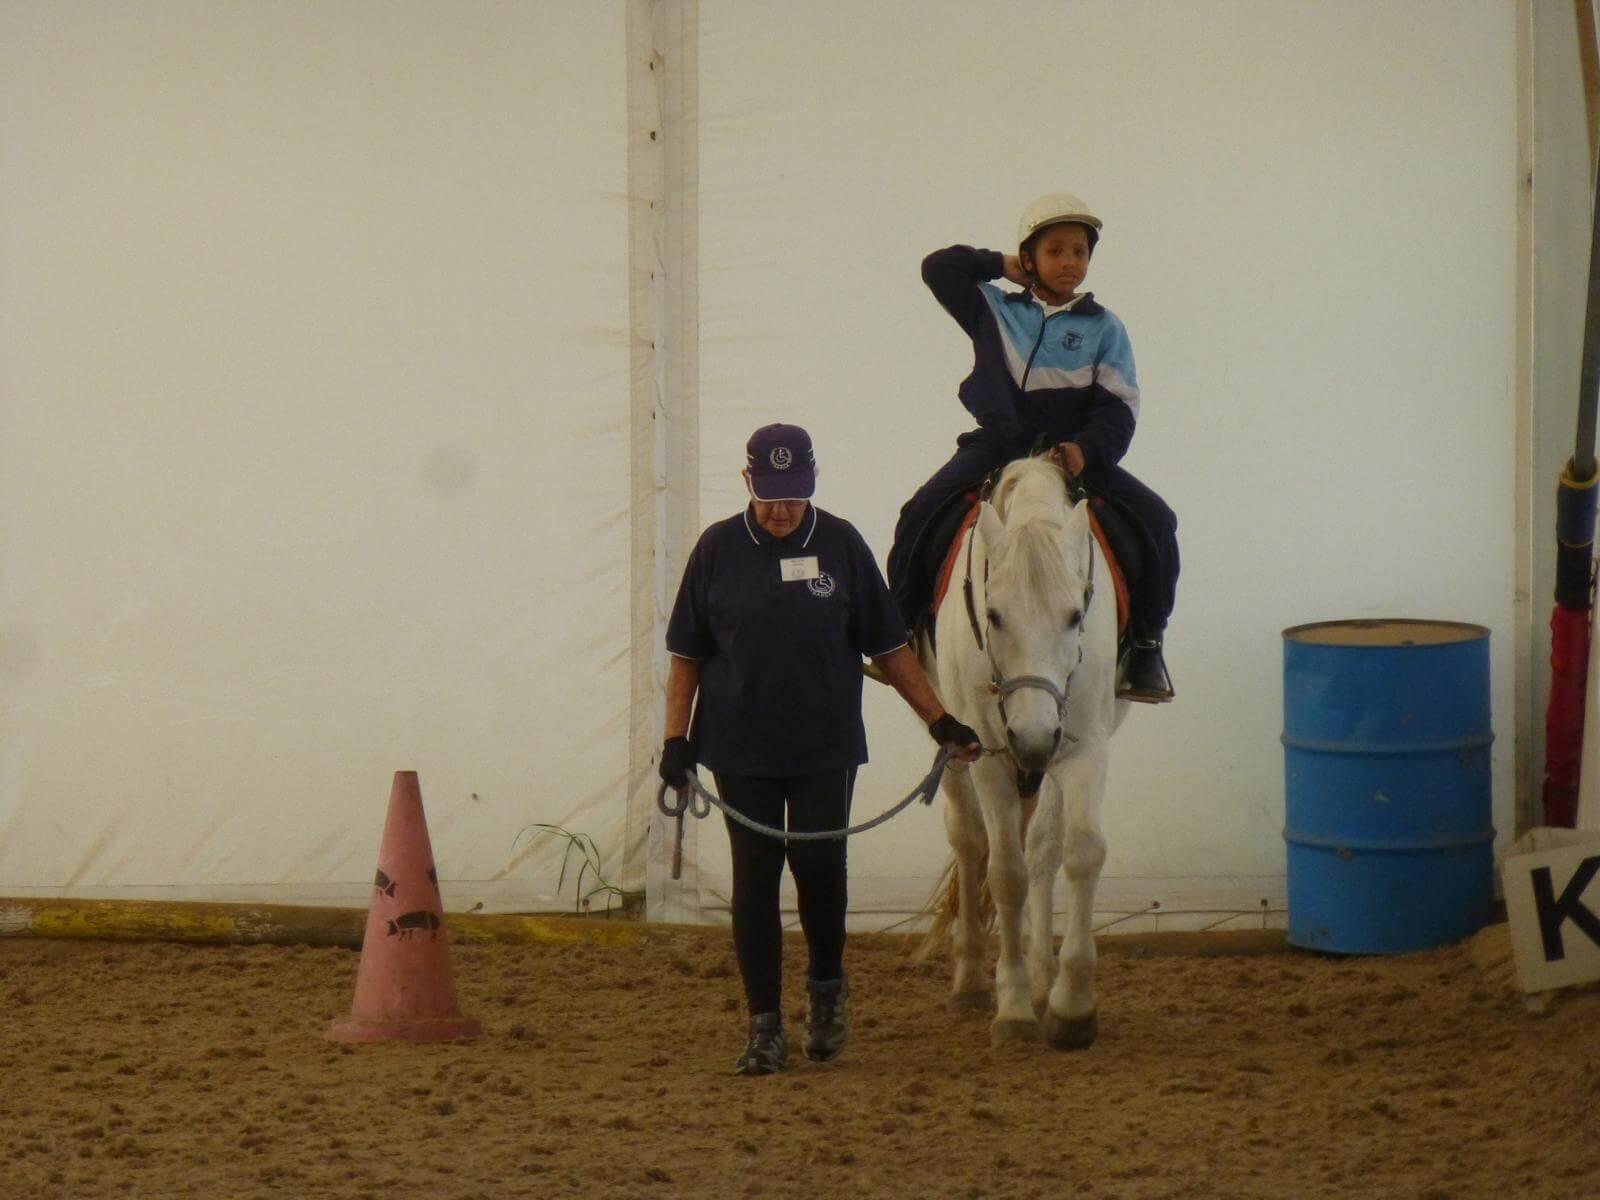 laras-amazing-race-projekt-therapeutisches-reiten-05